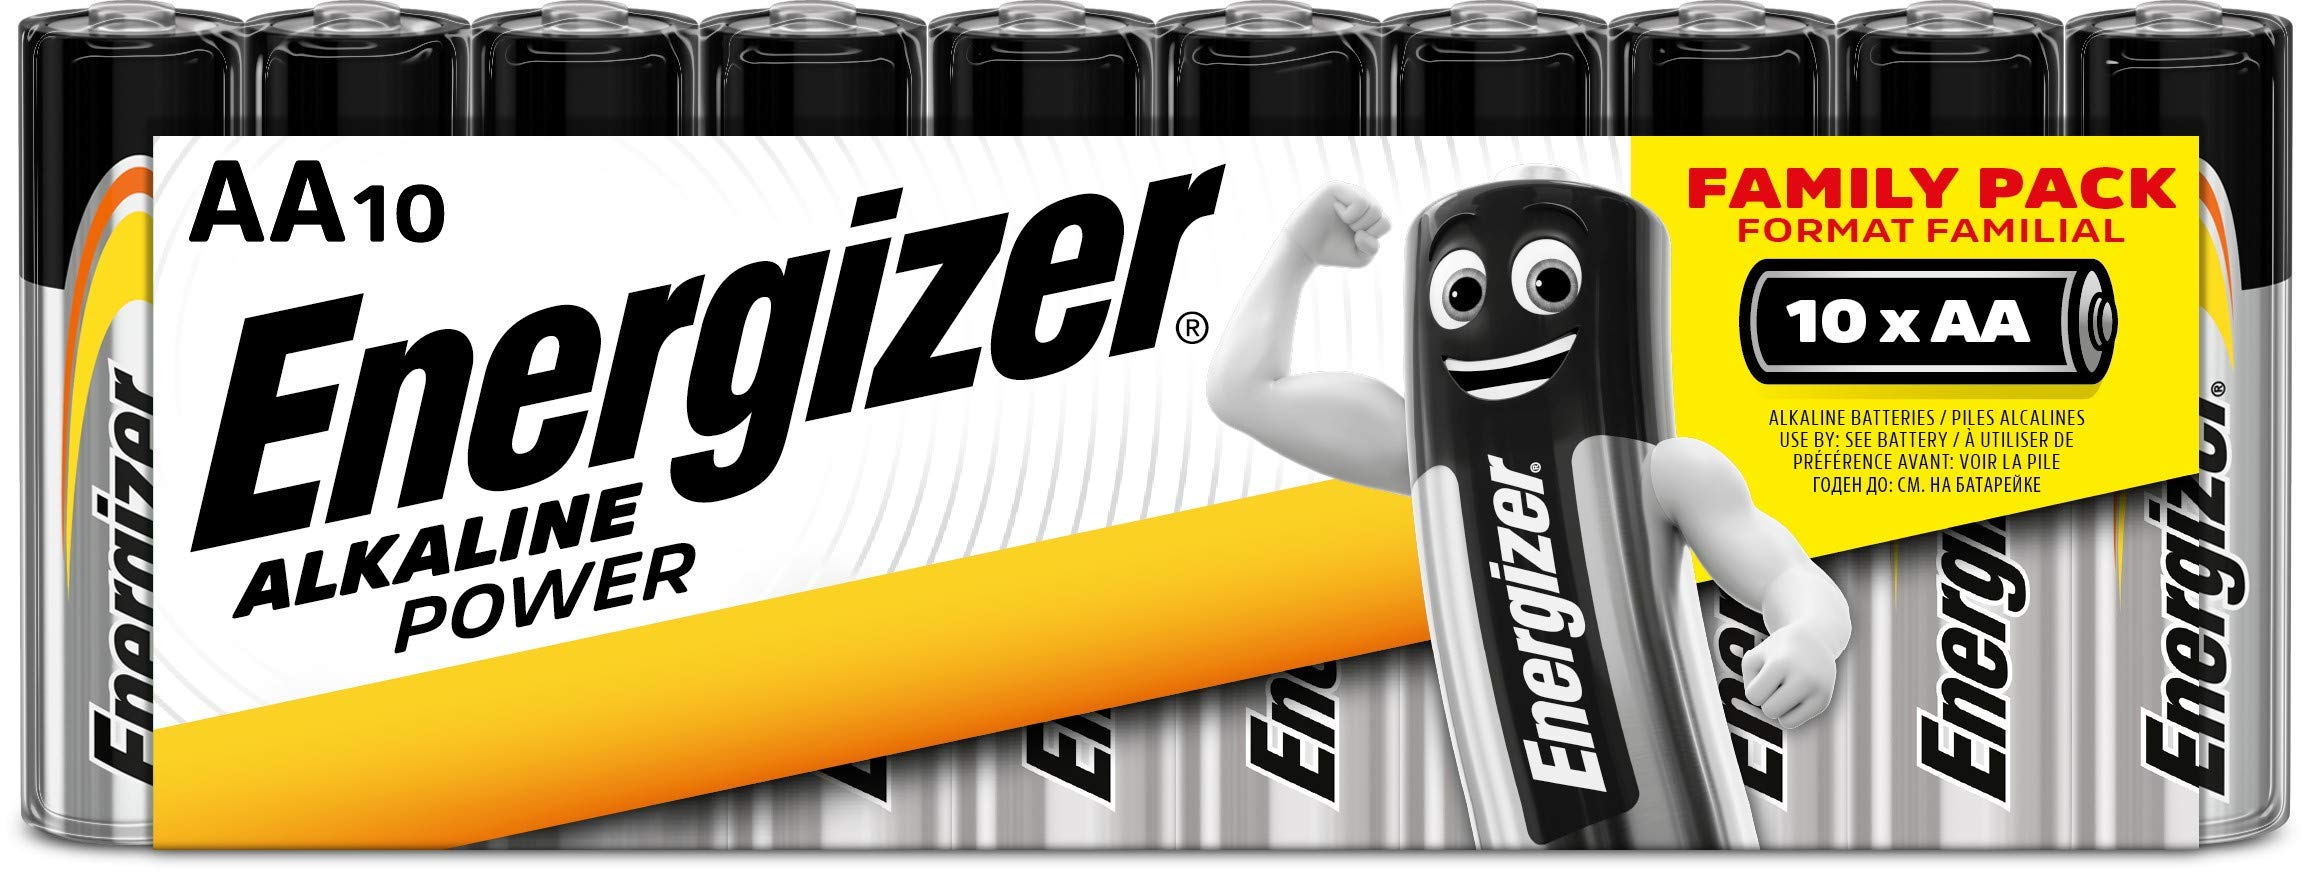 Energizer – Box de 24 pilas alcalinas Alkaline Power